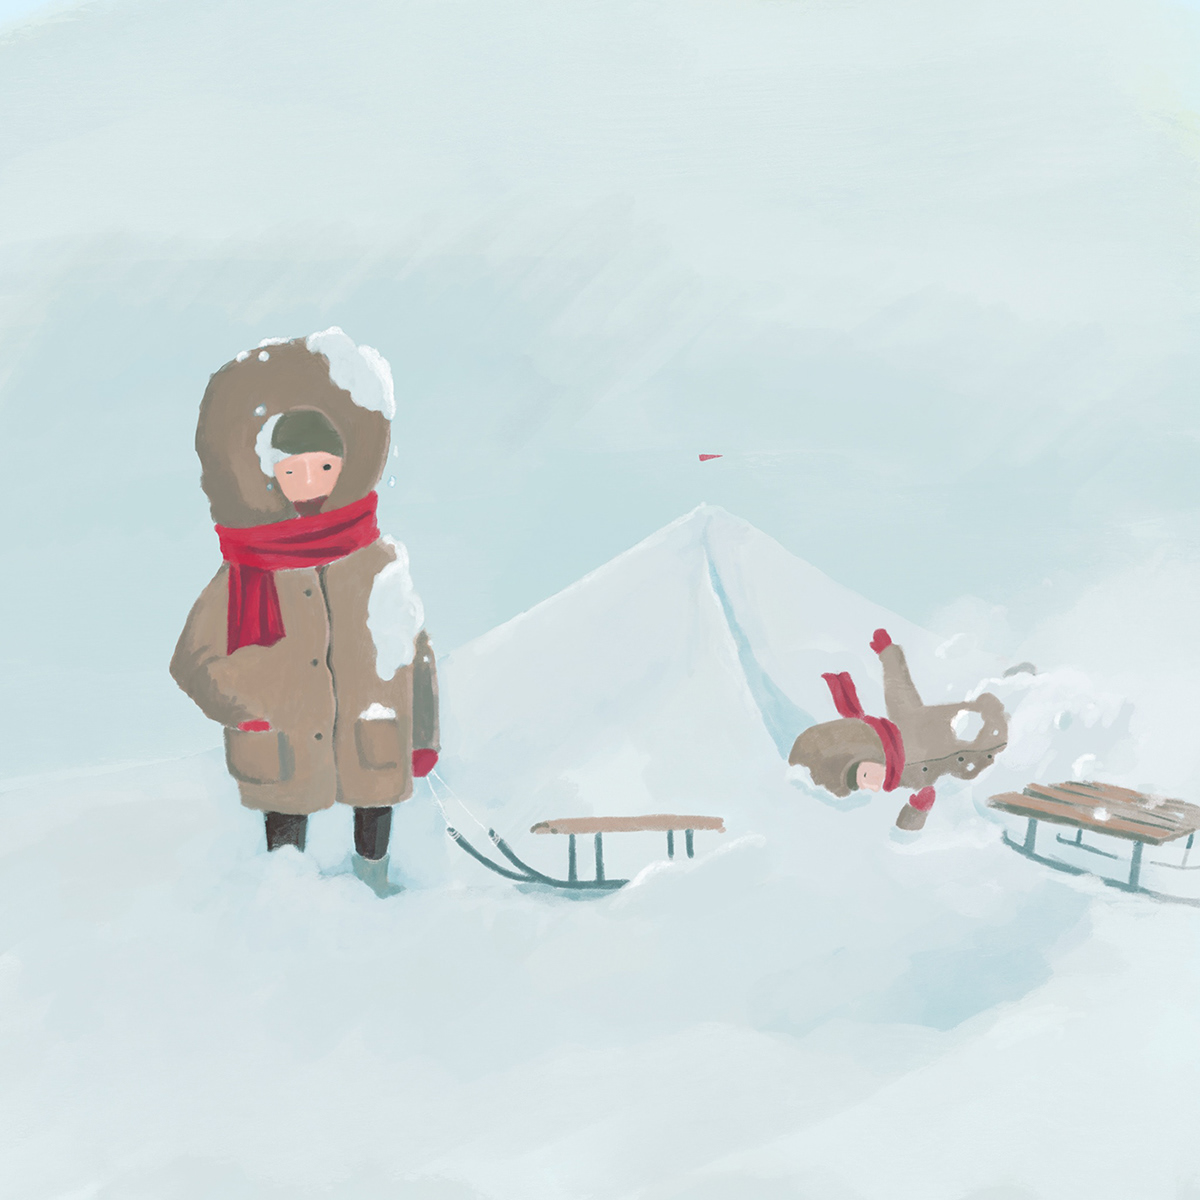 ILLUSTRATION  animation  dark winter lithuania lietuva klaipeda snow